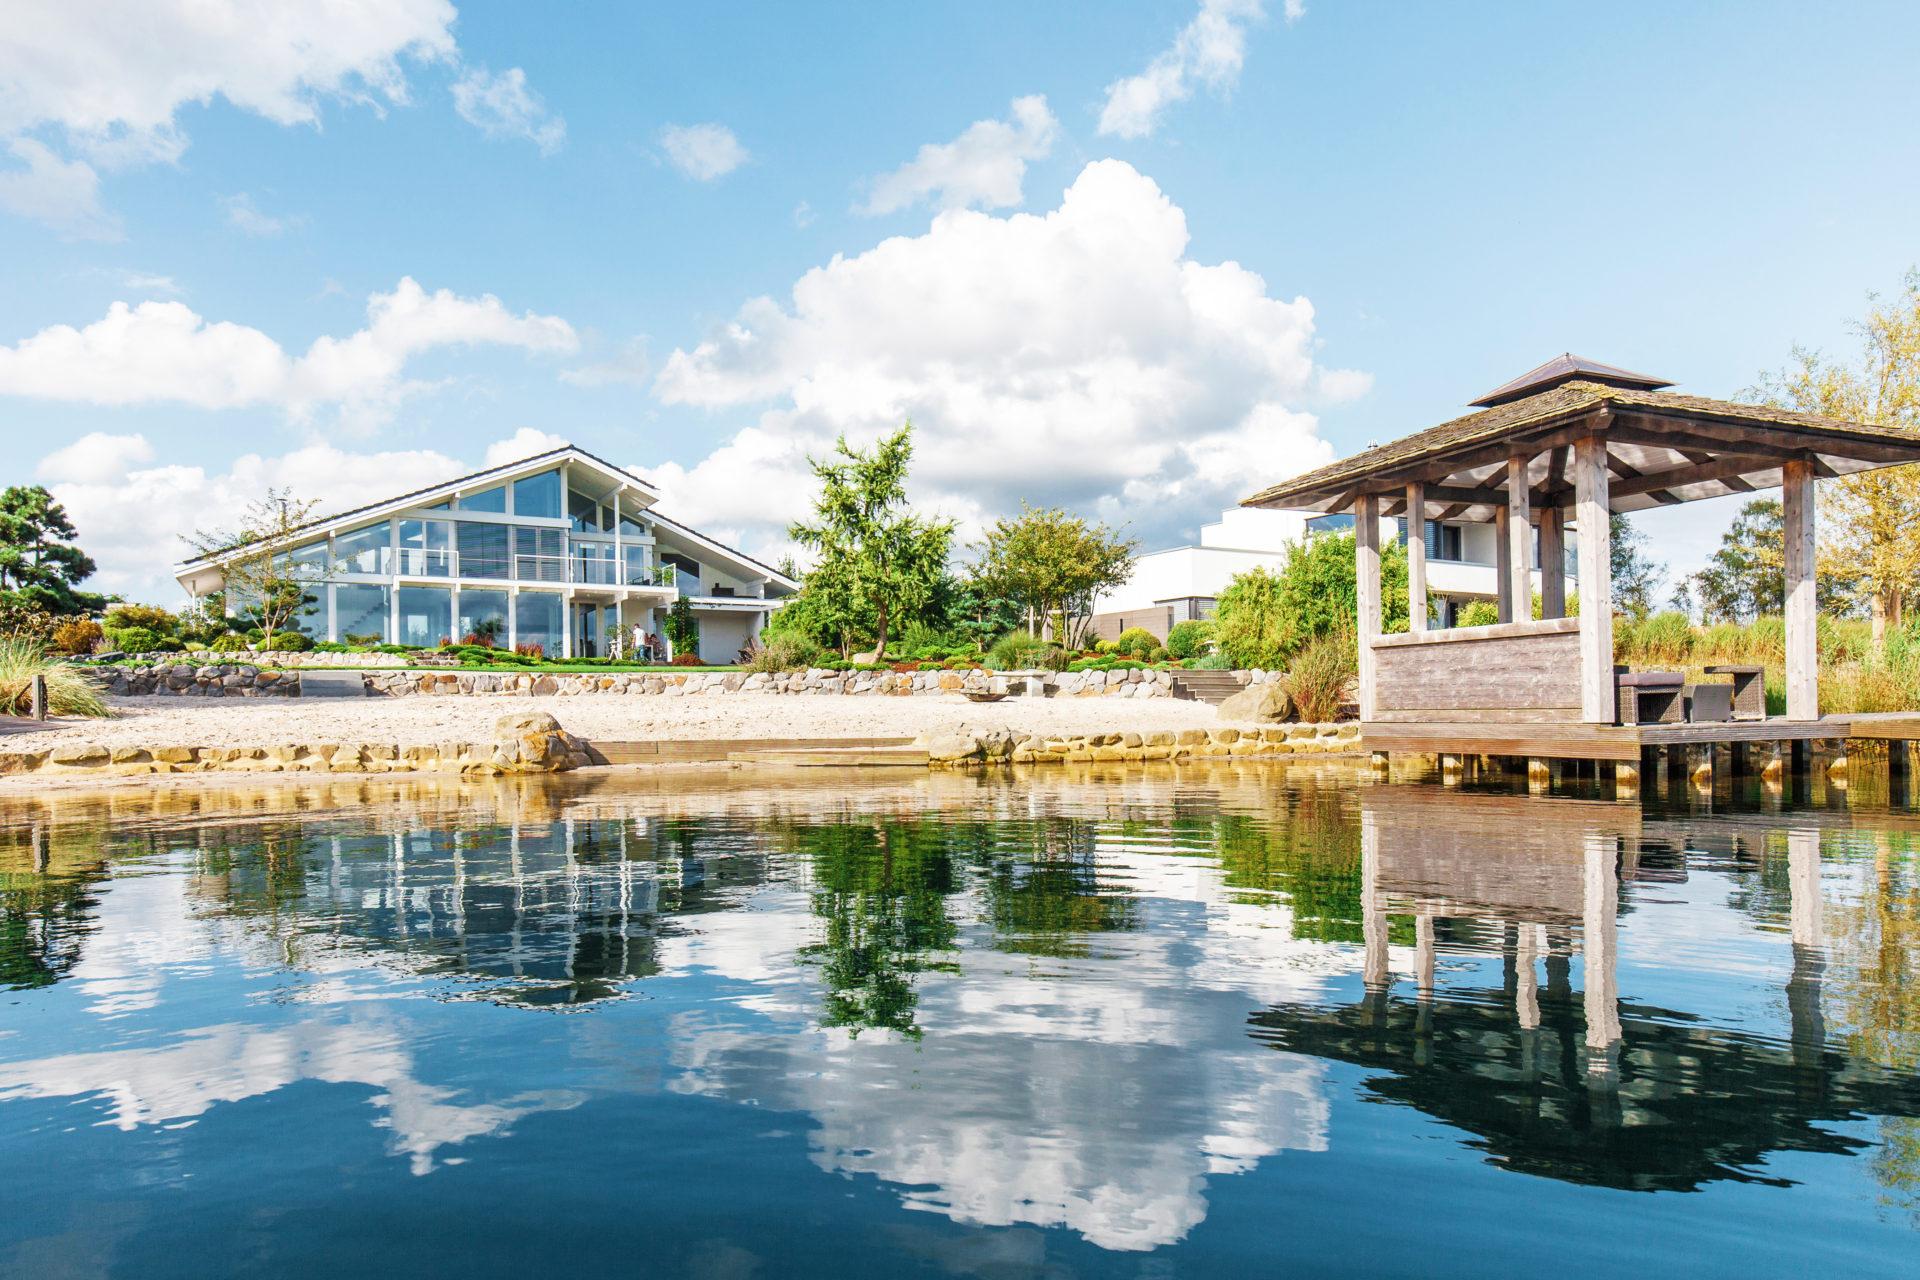 Concentus Fachwerkhaus Hausbau Holzhaus Architektenhaus